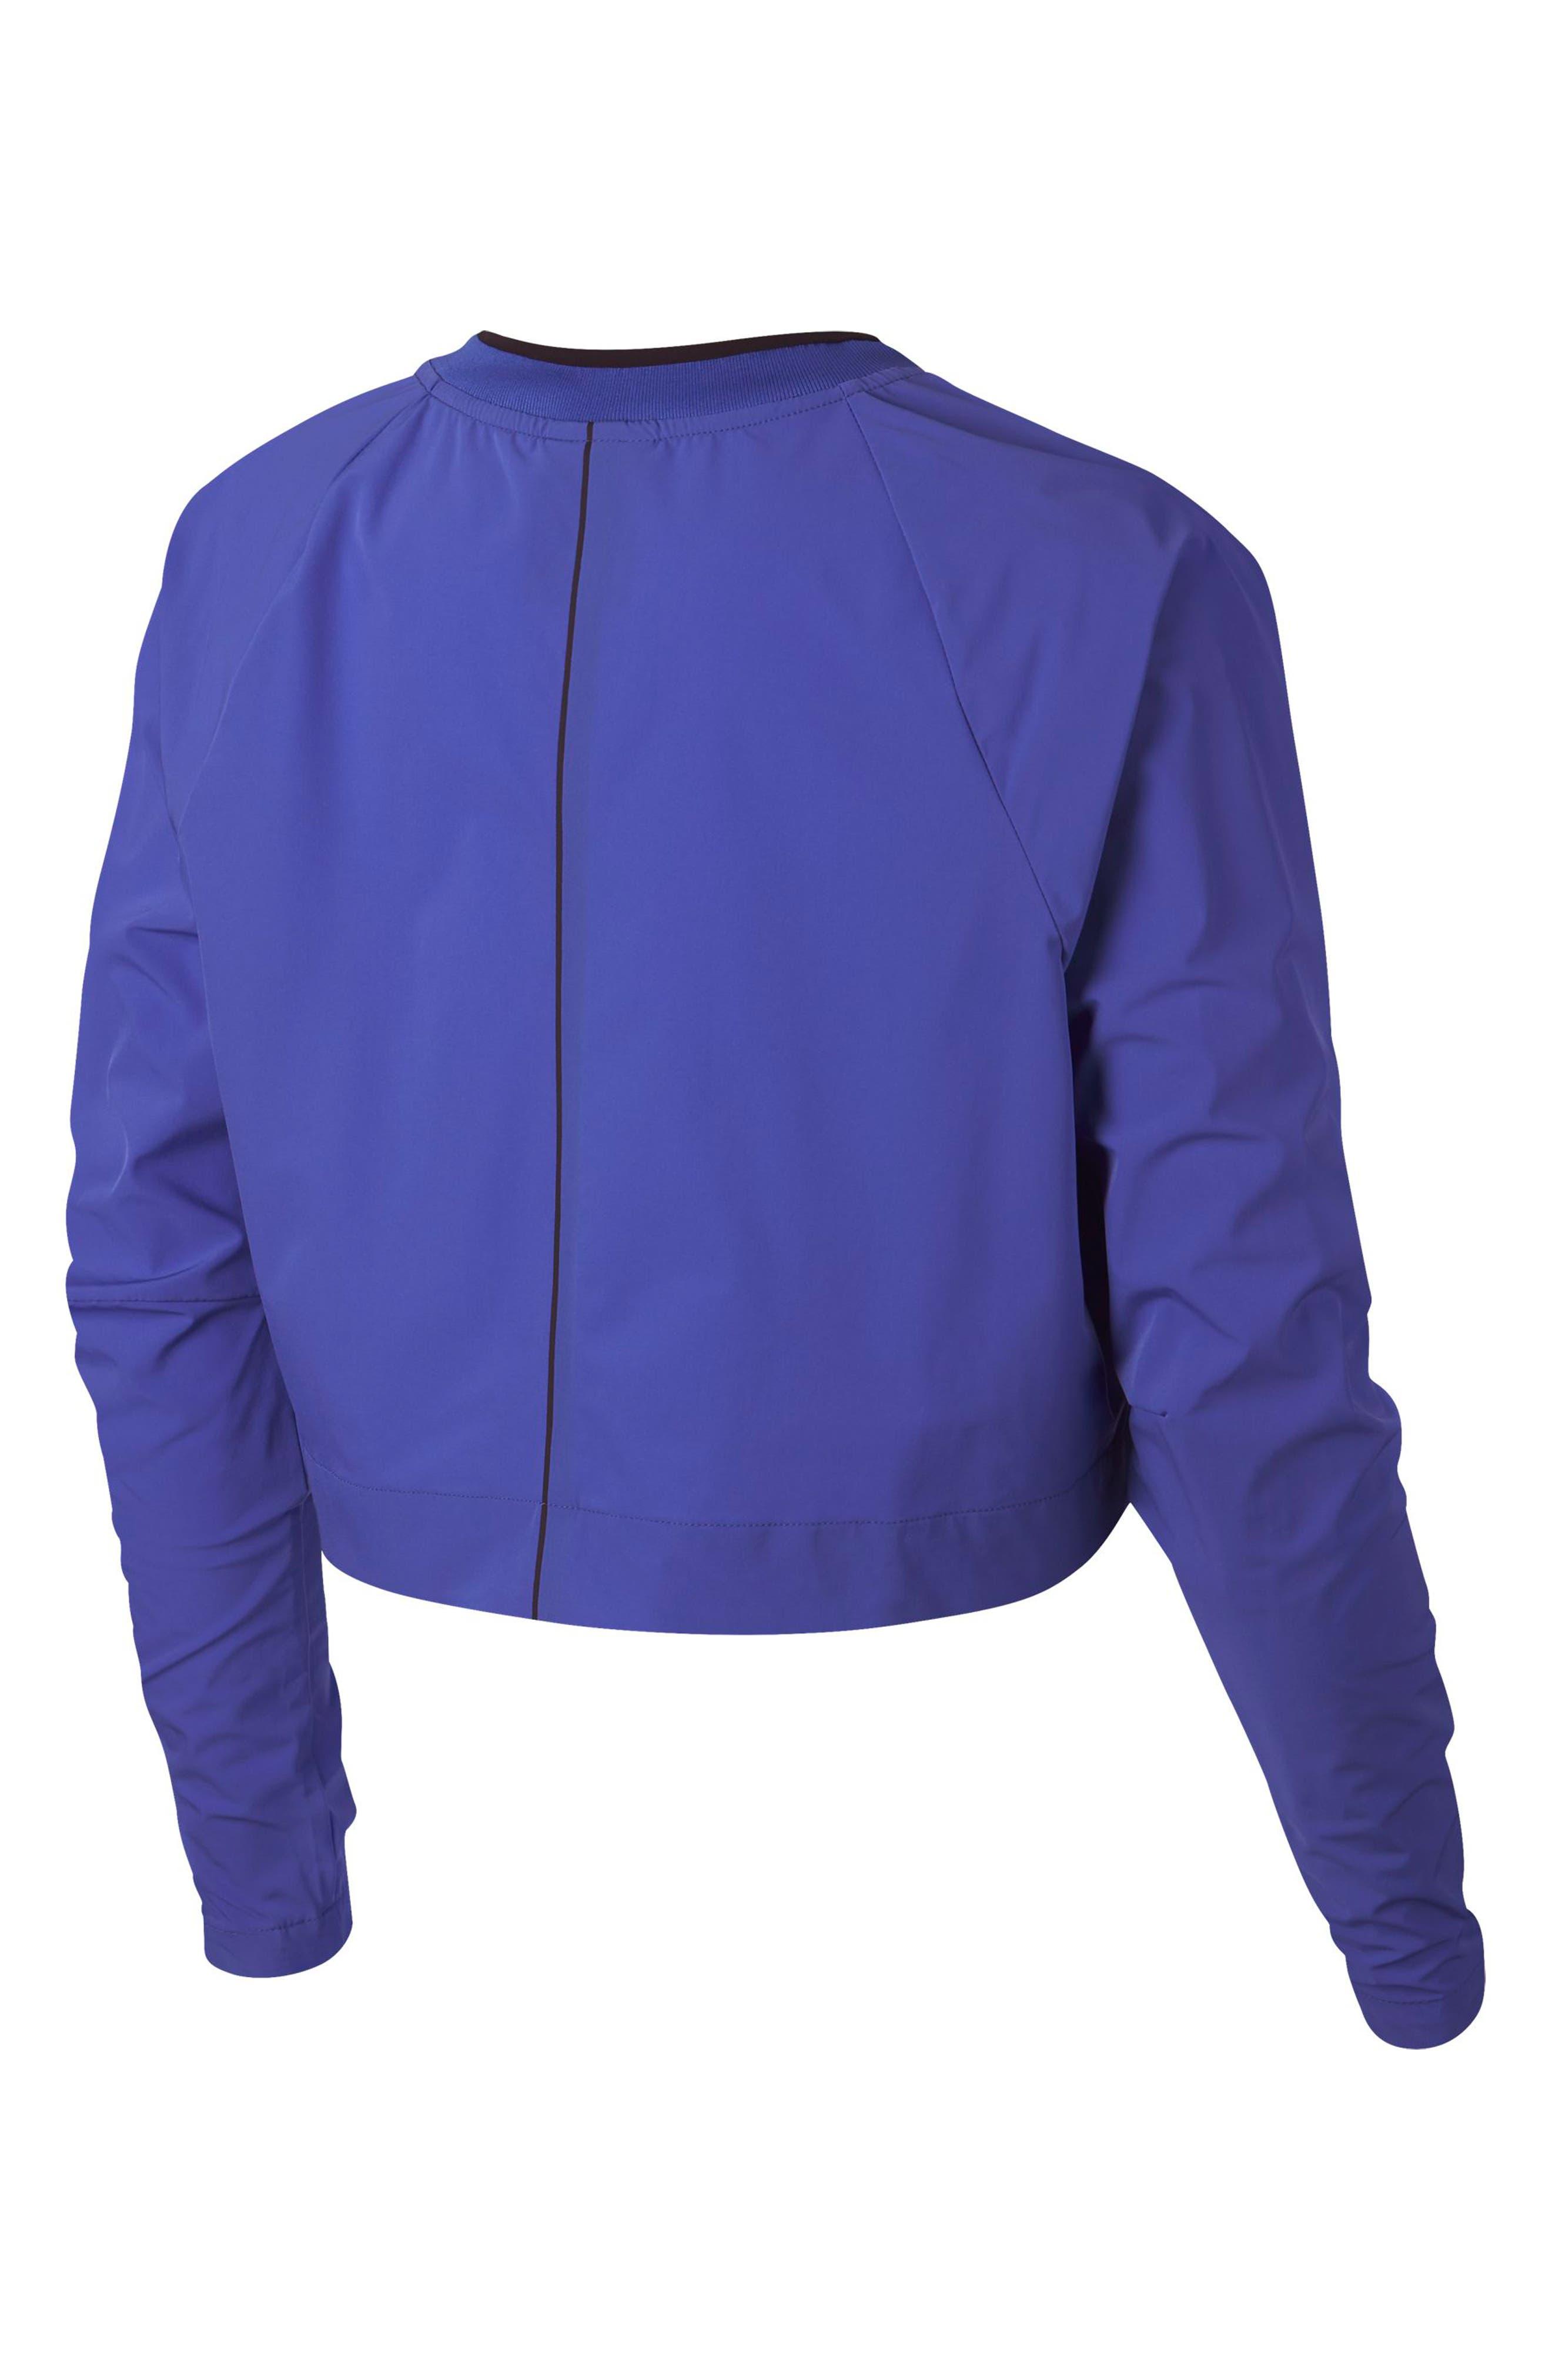 Sportswear Tech Pack Women's Long Sleeve Top,                             Alternate thumbnail 8, color,                             PERSIAN VIOLET/ BURGUNDY ASH